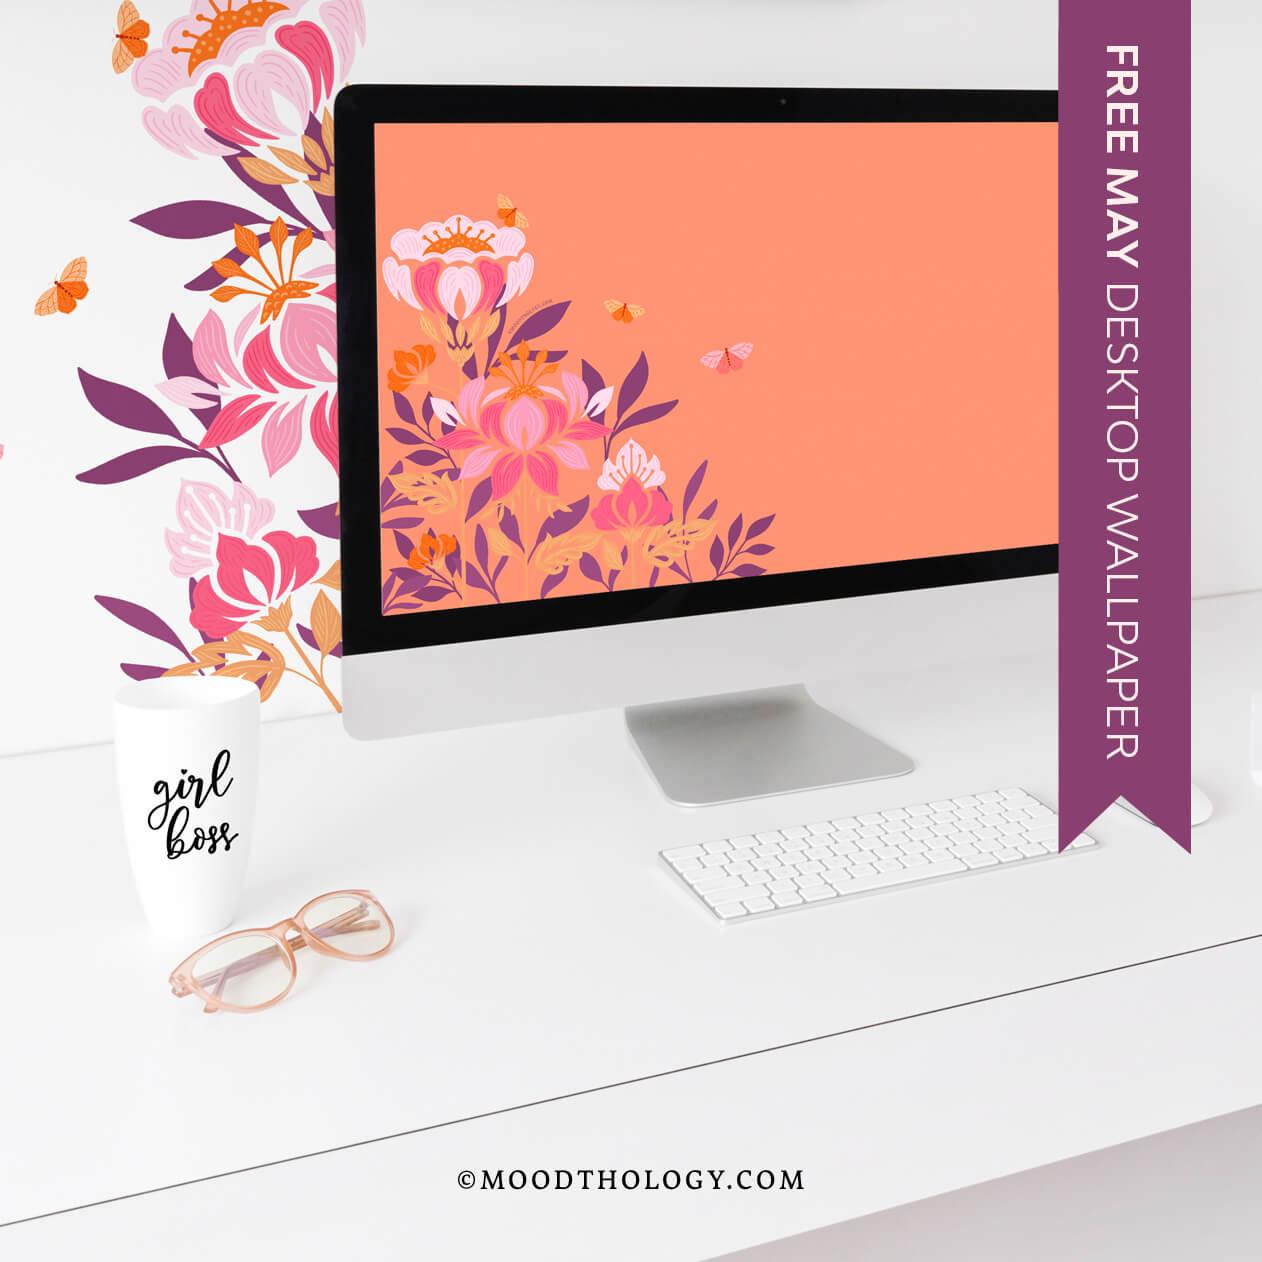 May 2021 Free Desktop Wallpaper By Moodthology Papery